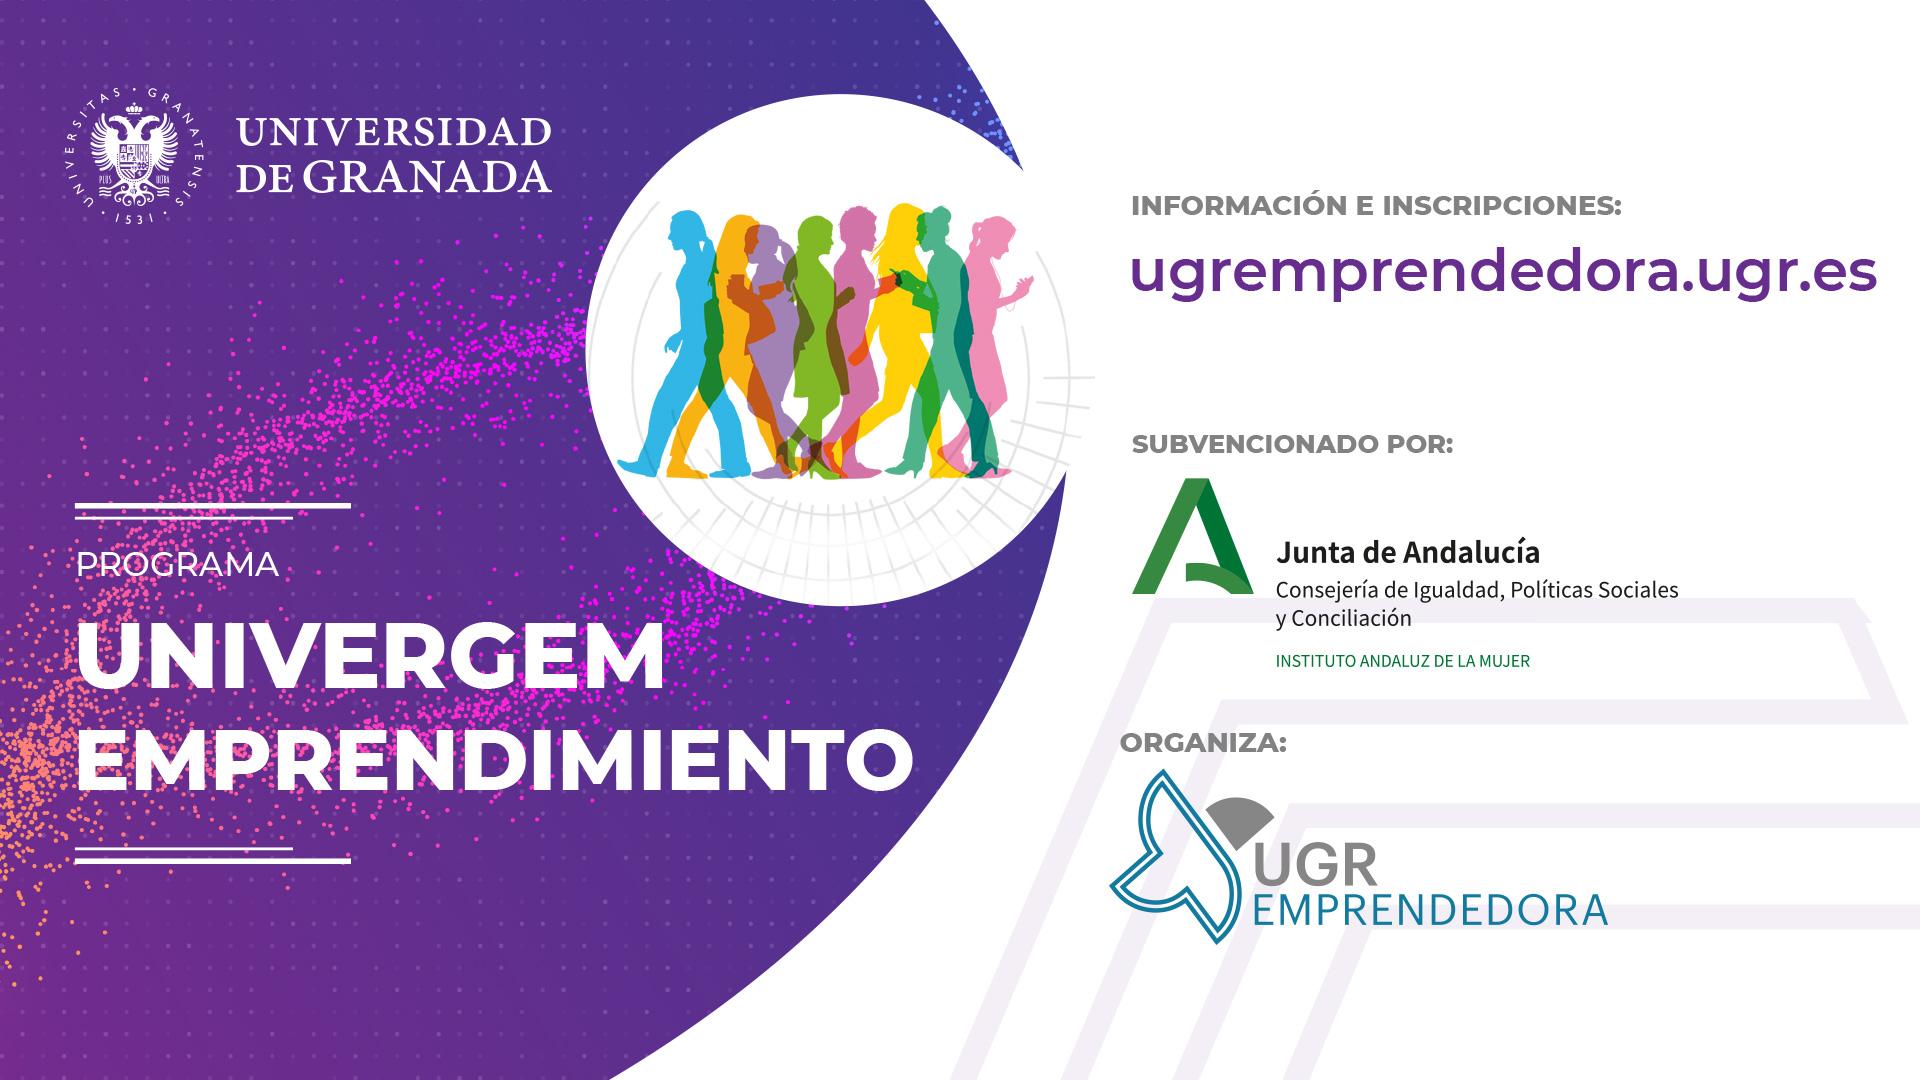 Programa Univergem Emprendimiento